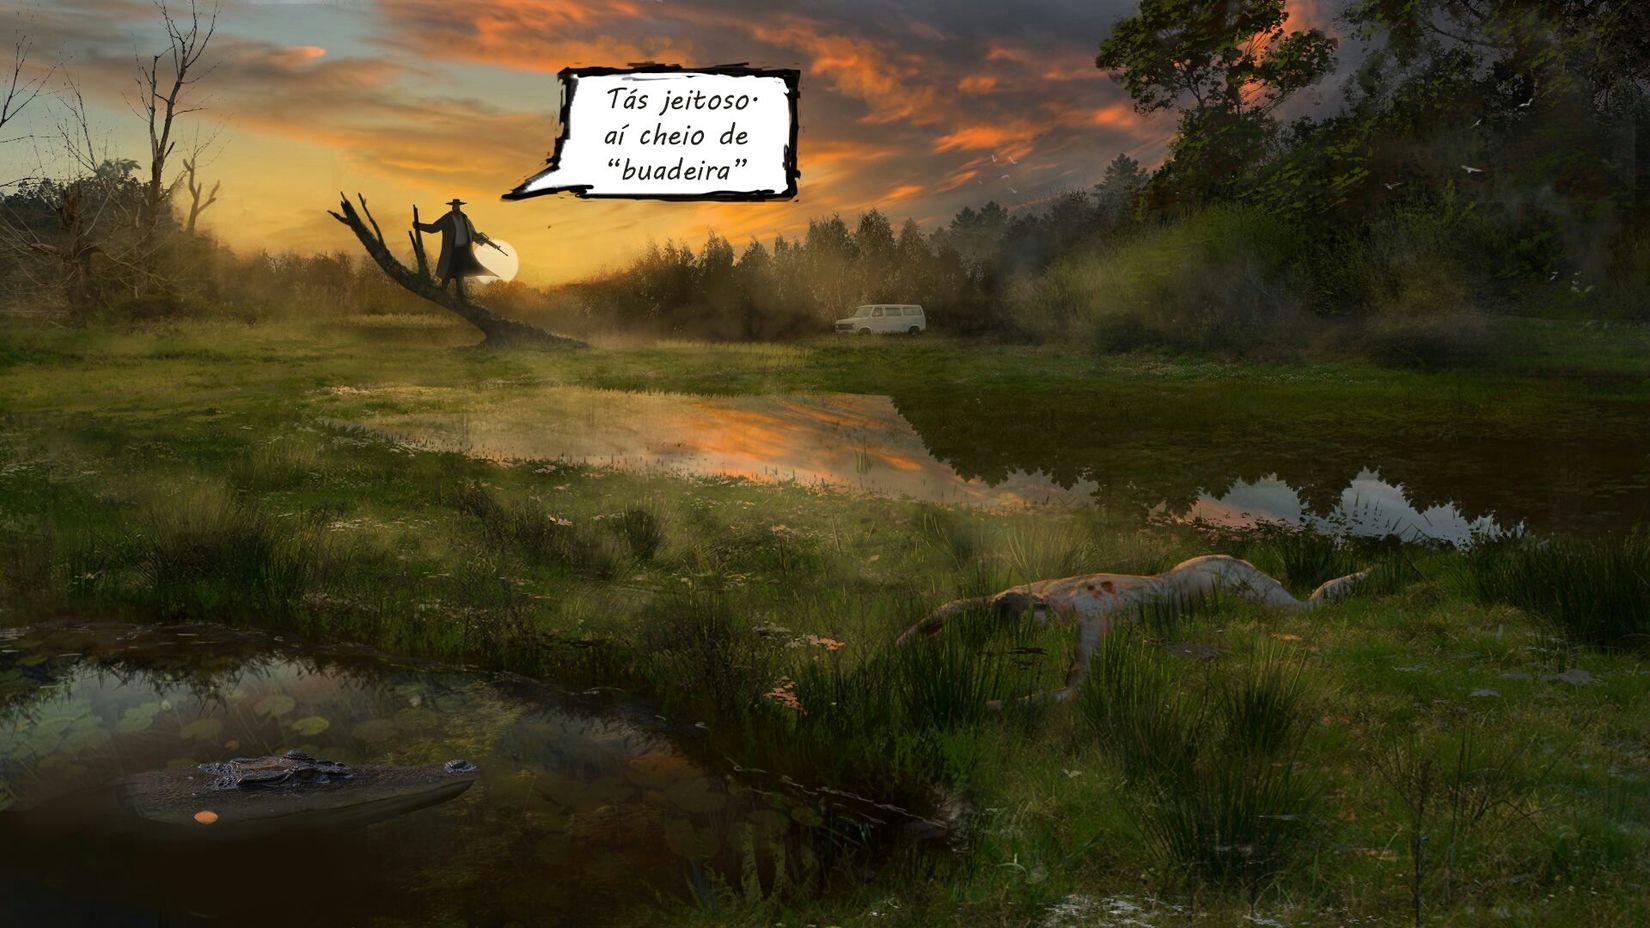 Conceptart Art, Drawing, Creativity Digital Art Illustration Swamp Landscape ArtWork Art Digital Painting